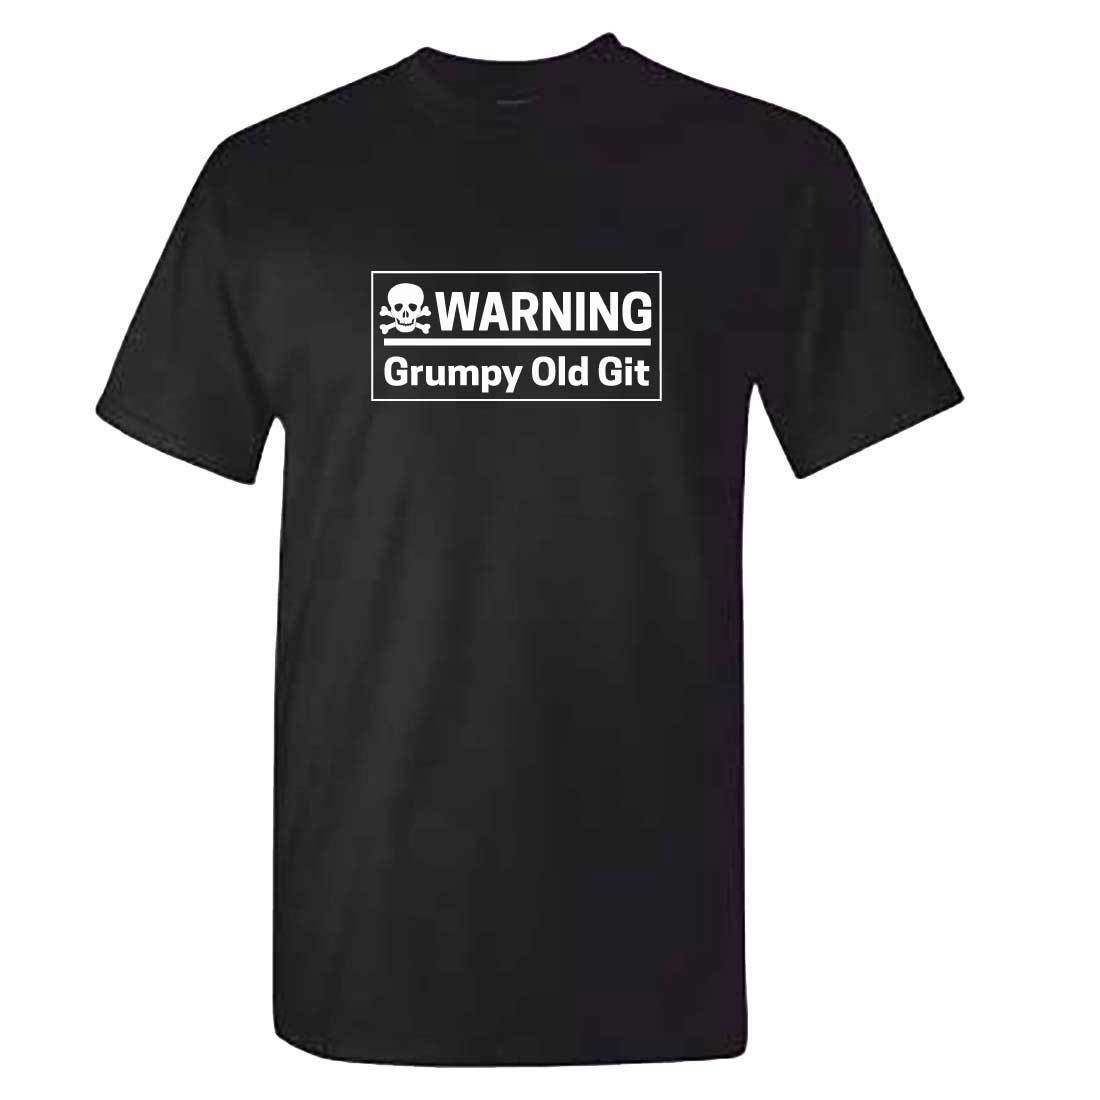 Mens Warning GRUMPY OLD GIT Tshirt - Old Man T Shirt - Funny Gift Fathers Day